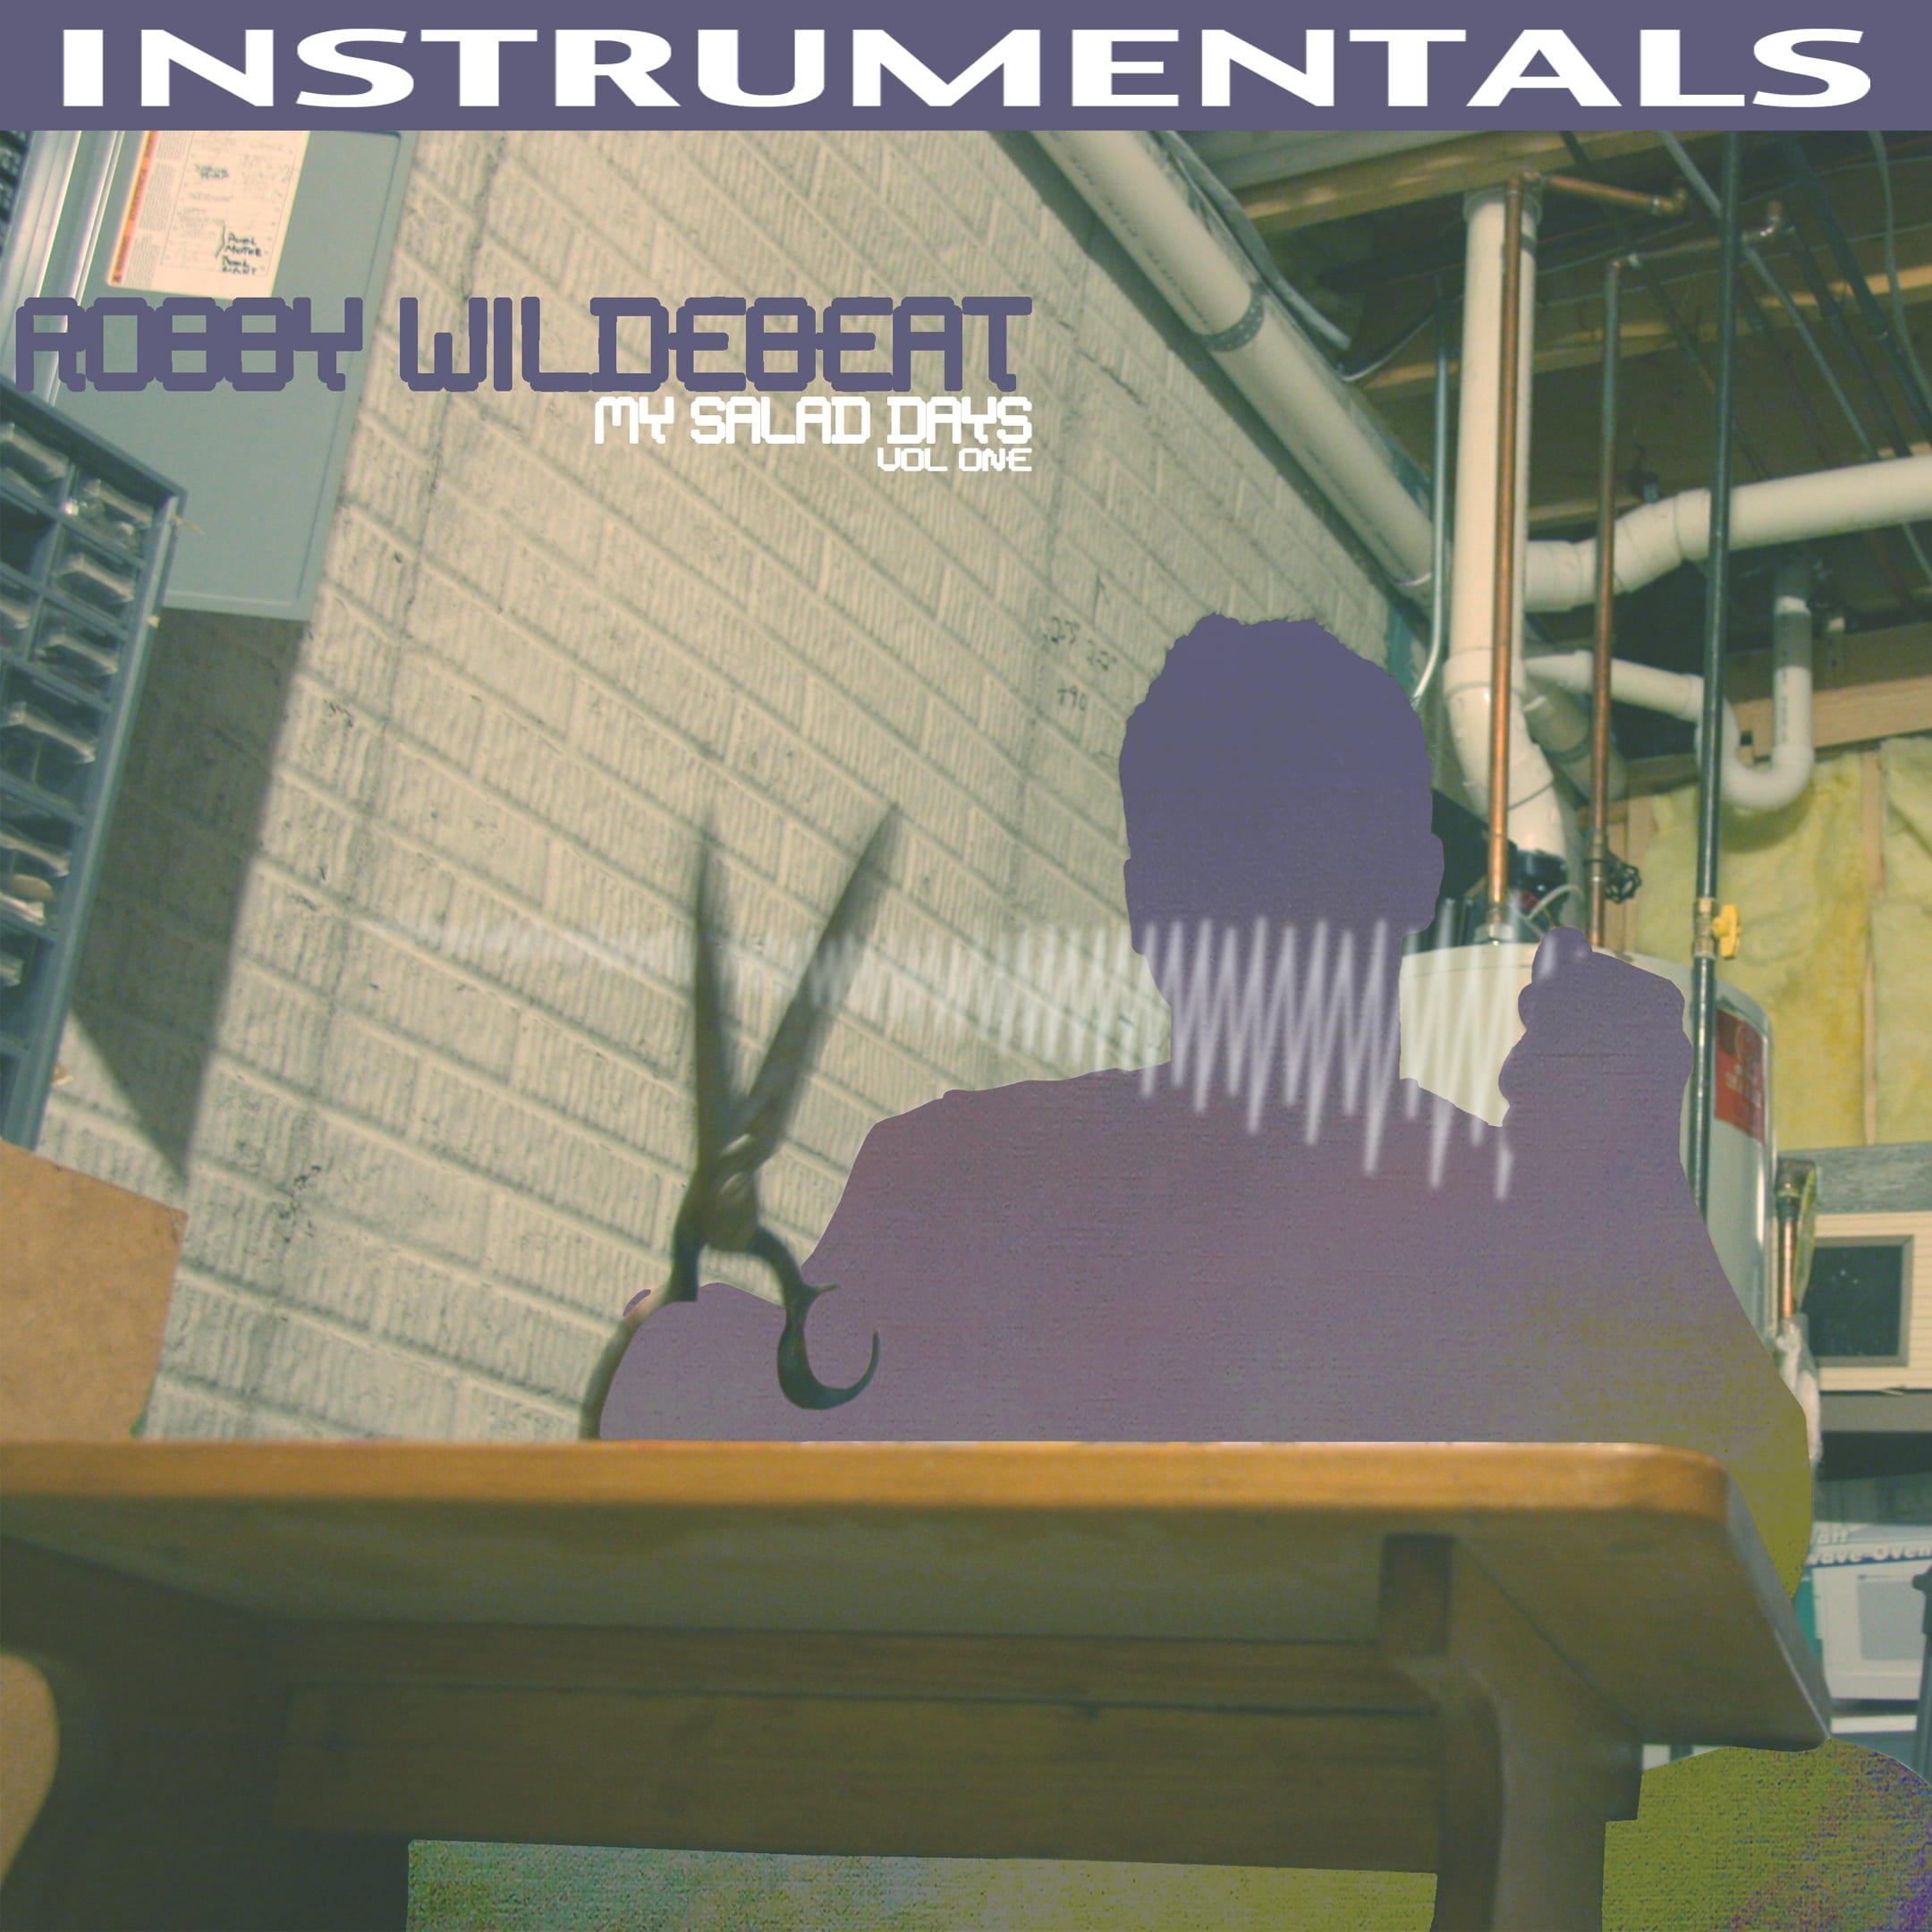 robby_wildebeat